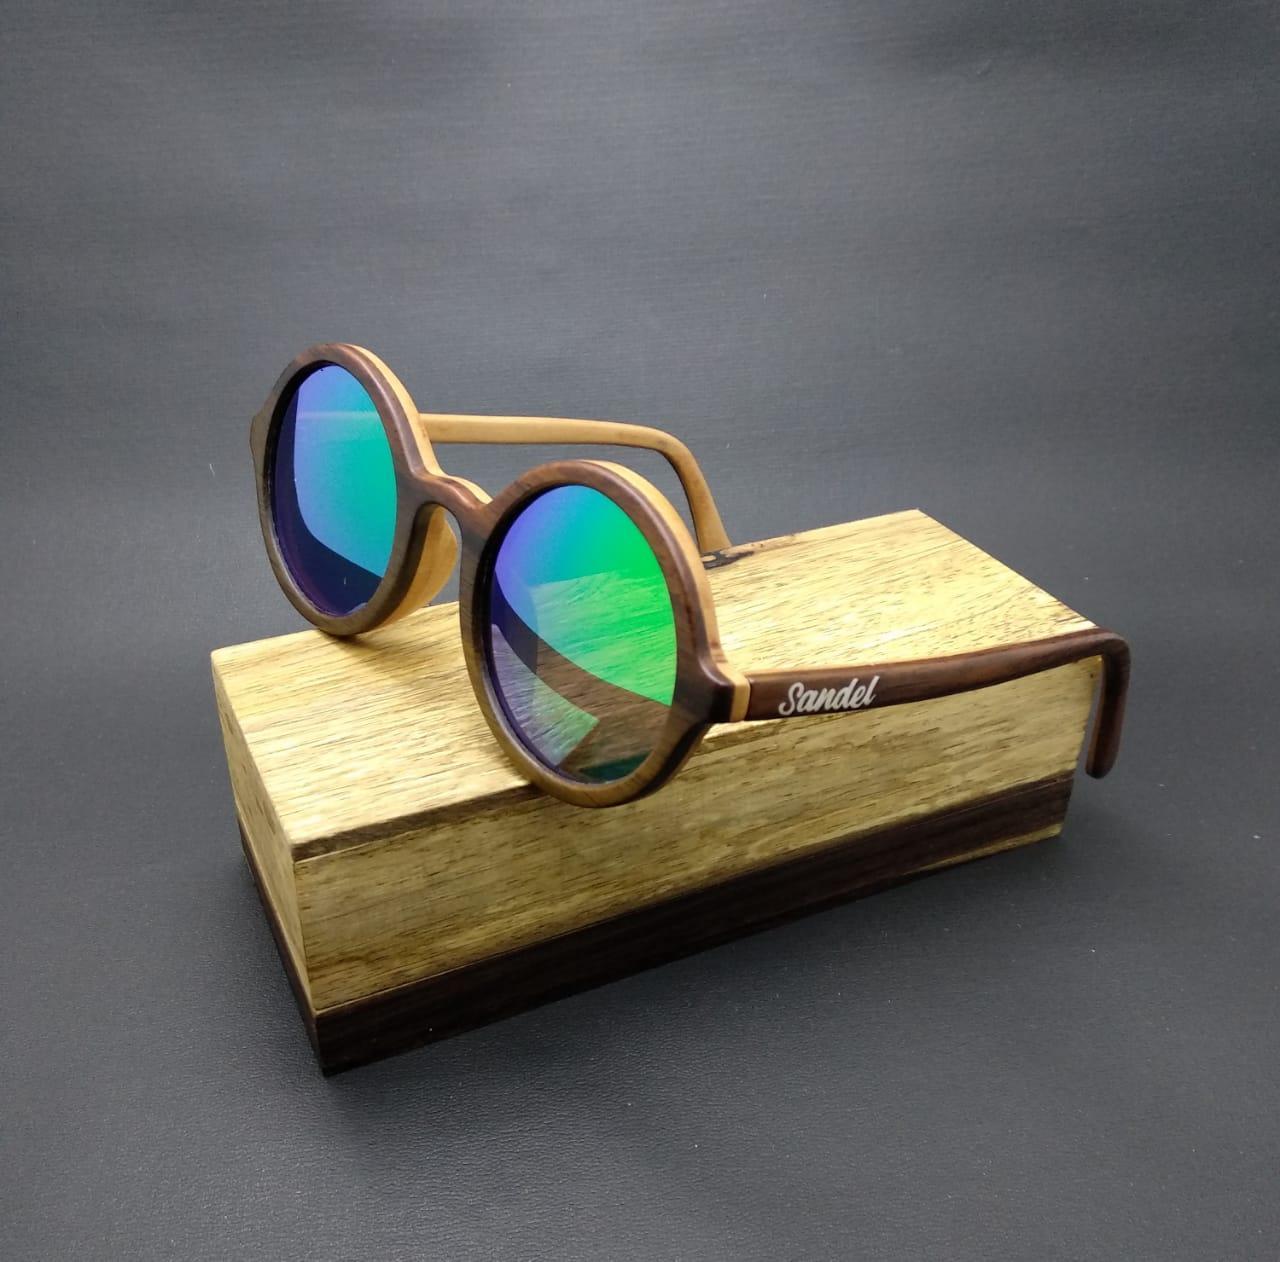 kacamata fasion pria wanita SANDEL new boboho lapis hijau